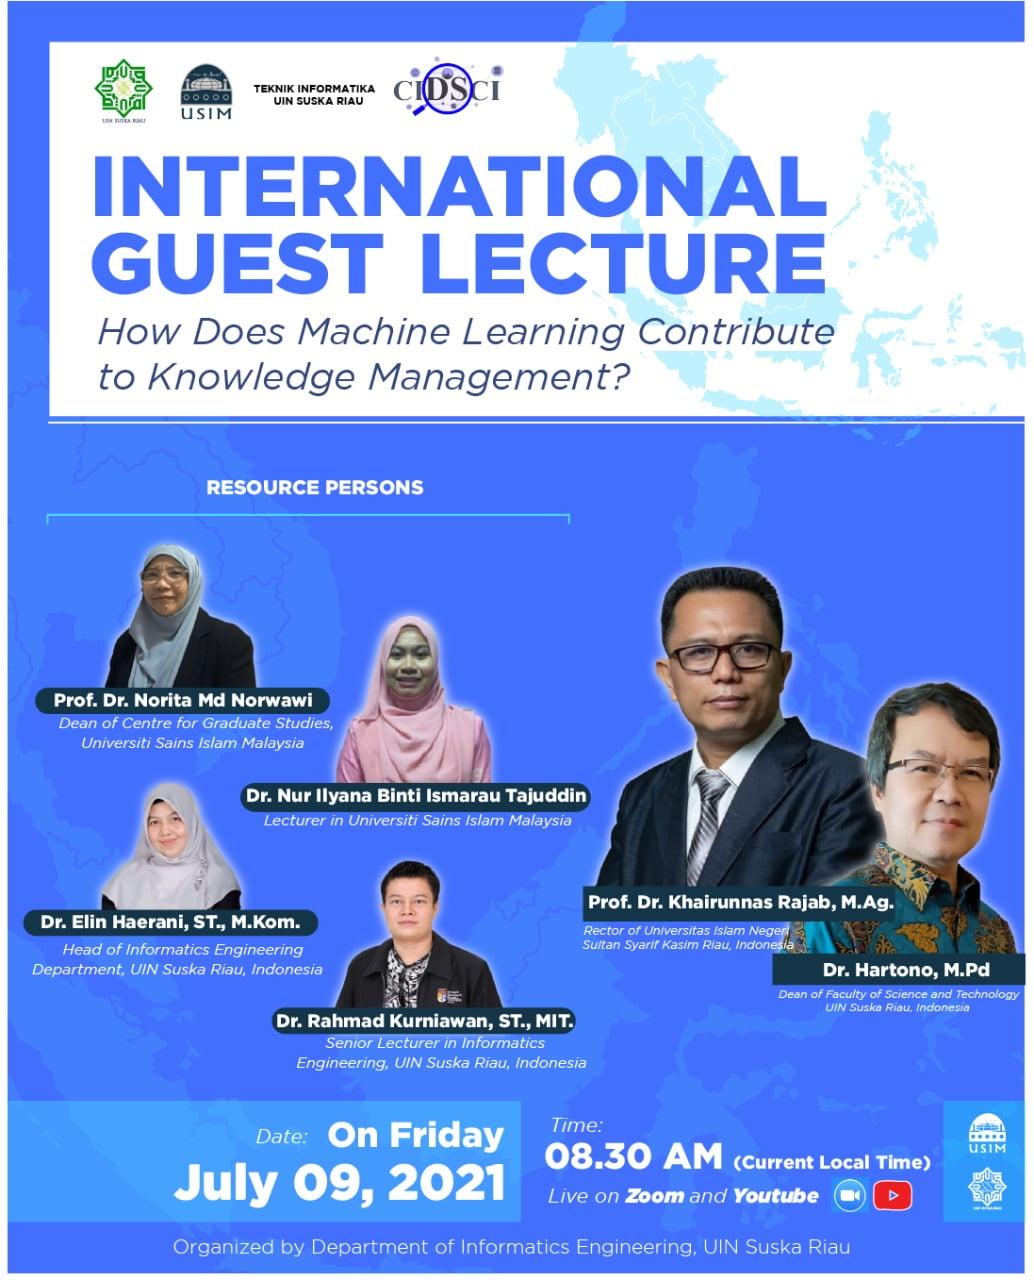 1st International Guest Lecture of Prodi Teknik Informatika UIN Suska Riau, Indonesia - Universiti Islam Sains Malaysia